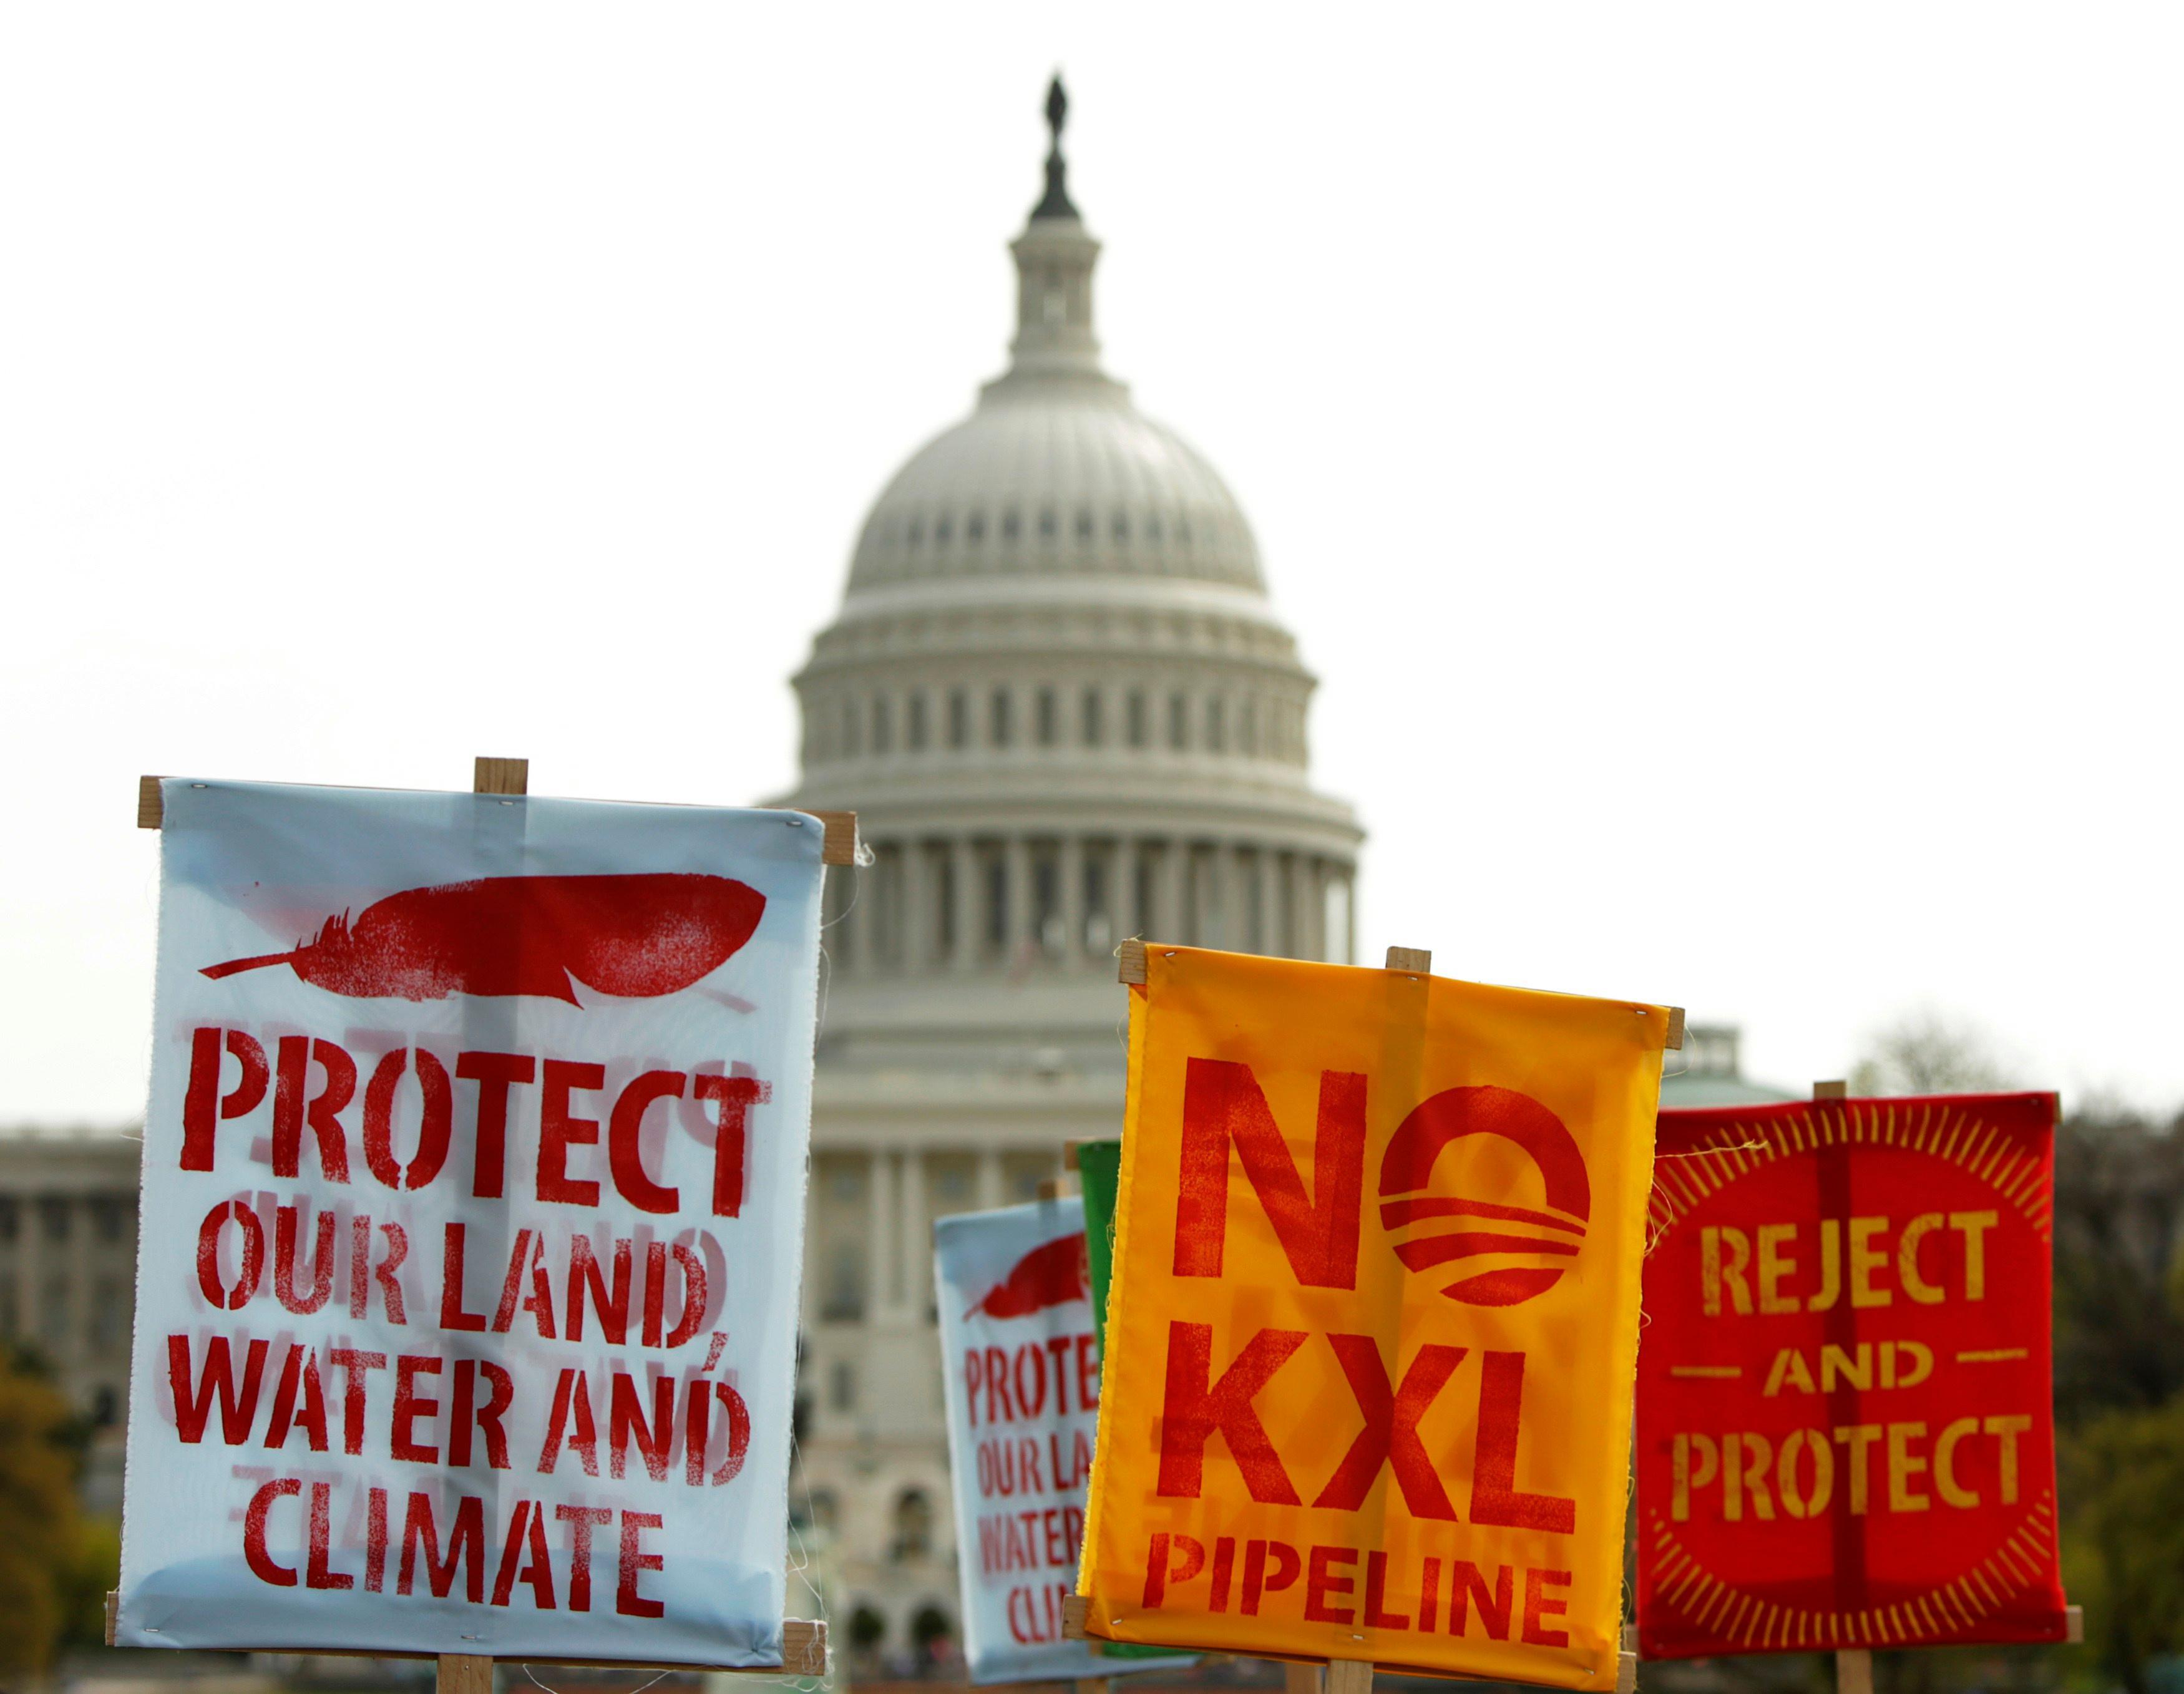 Revealed: FBI and police monitoring Oregon anti-pipeline activists